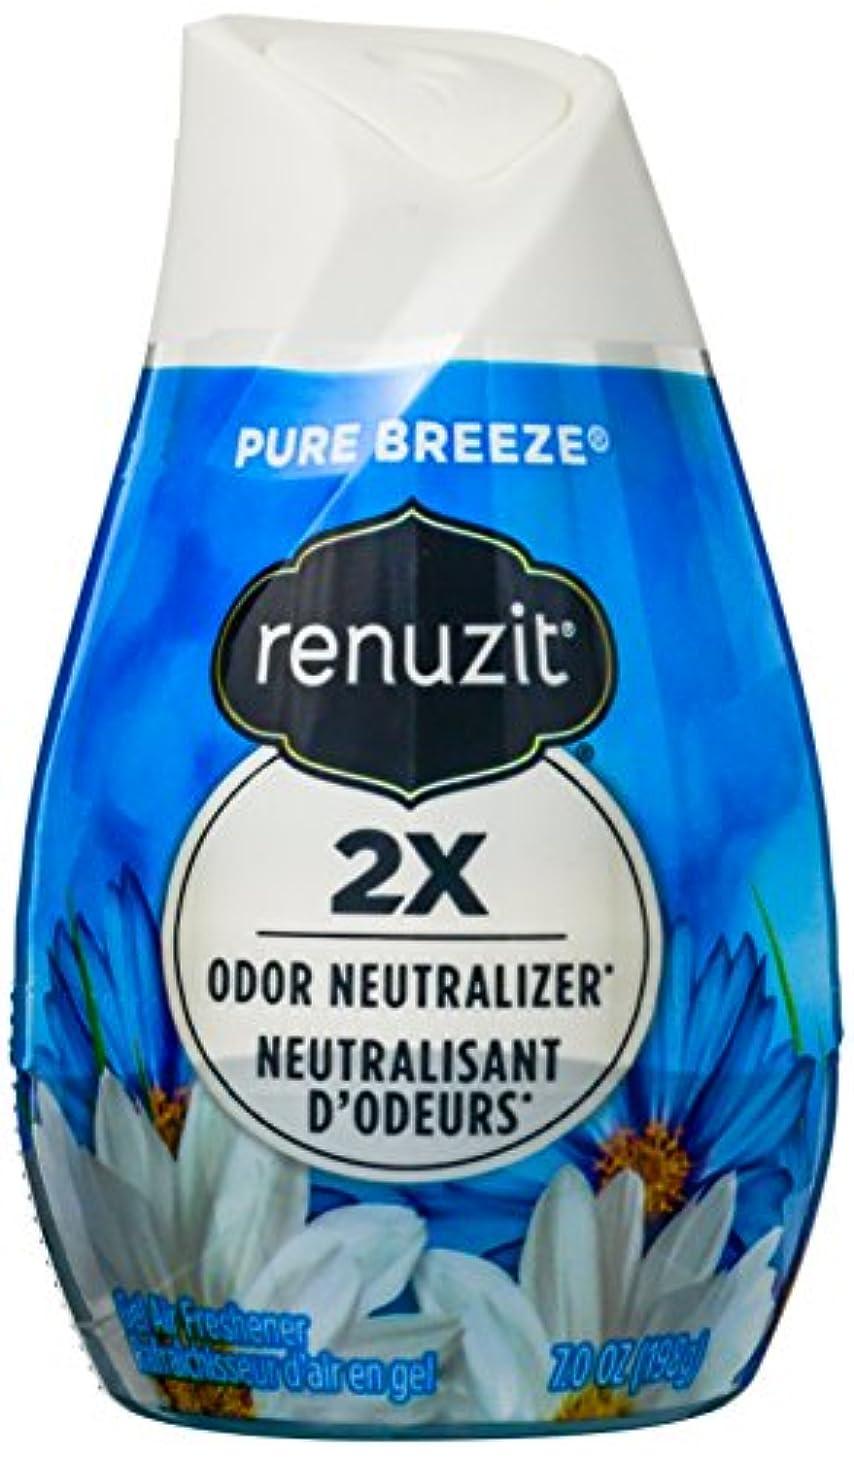 Renuzit Adjustables Air Freshener, Pure Breeze, 7 Ounce mlmexb1631009